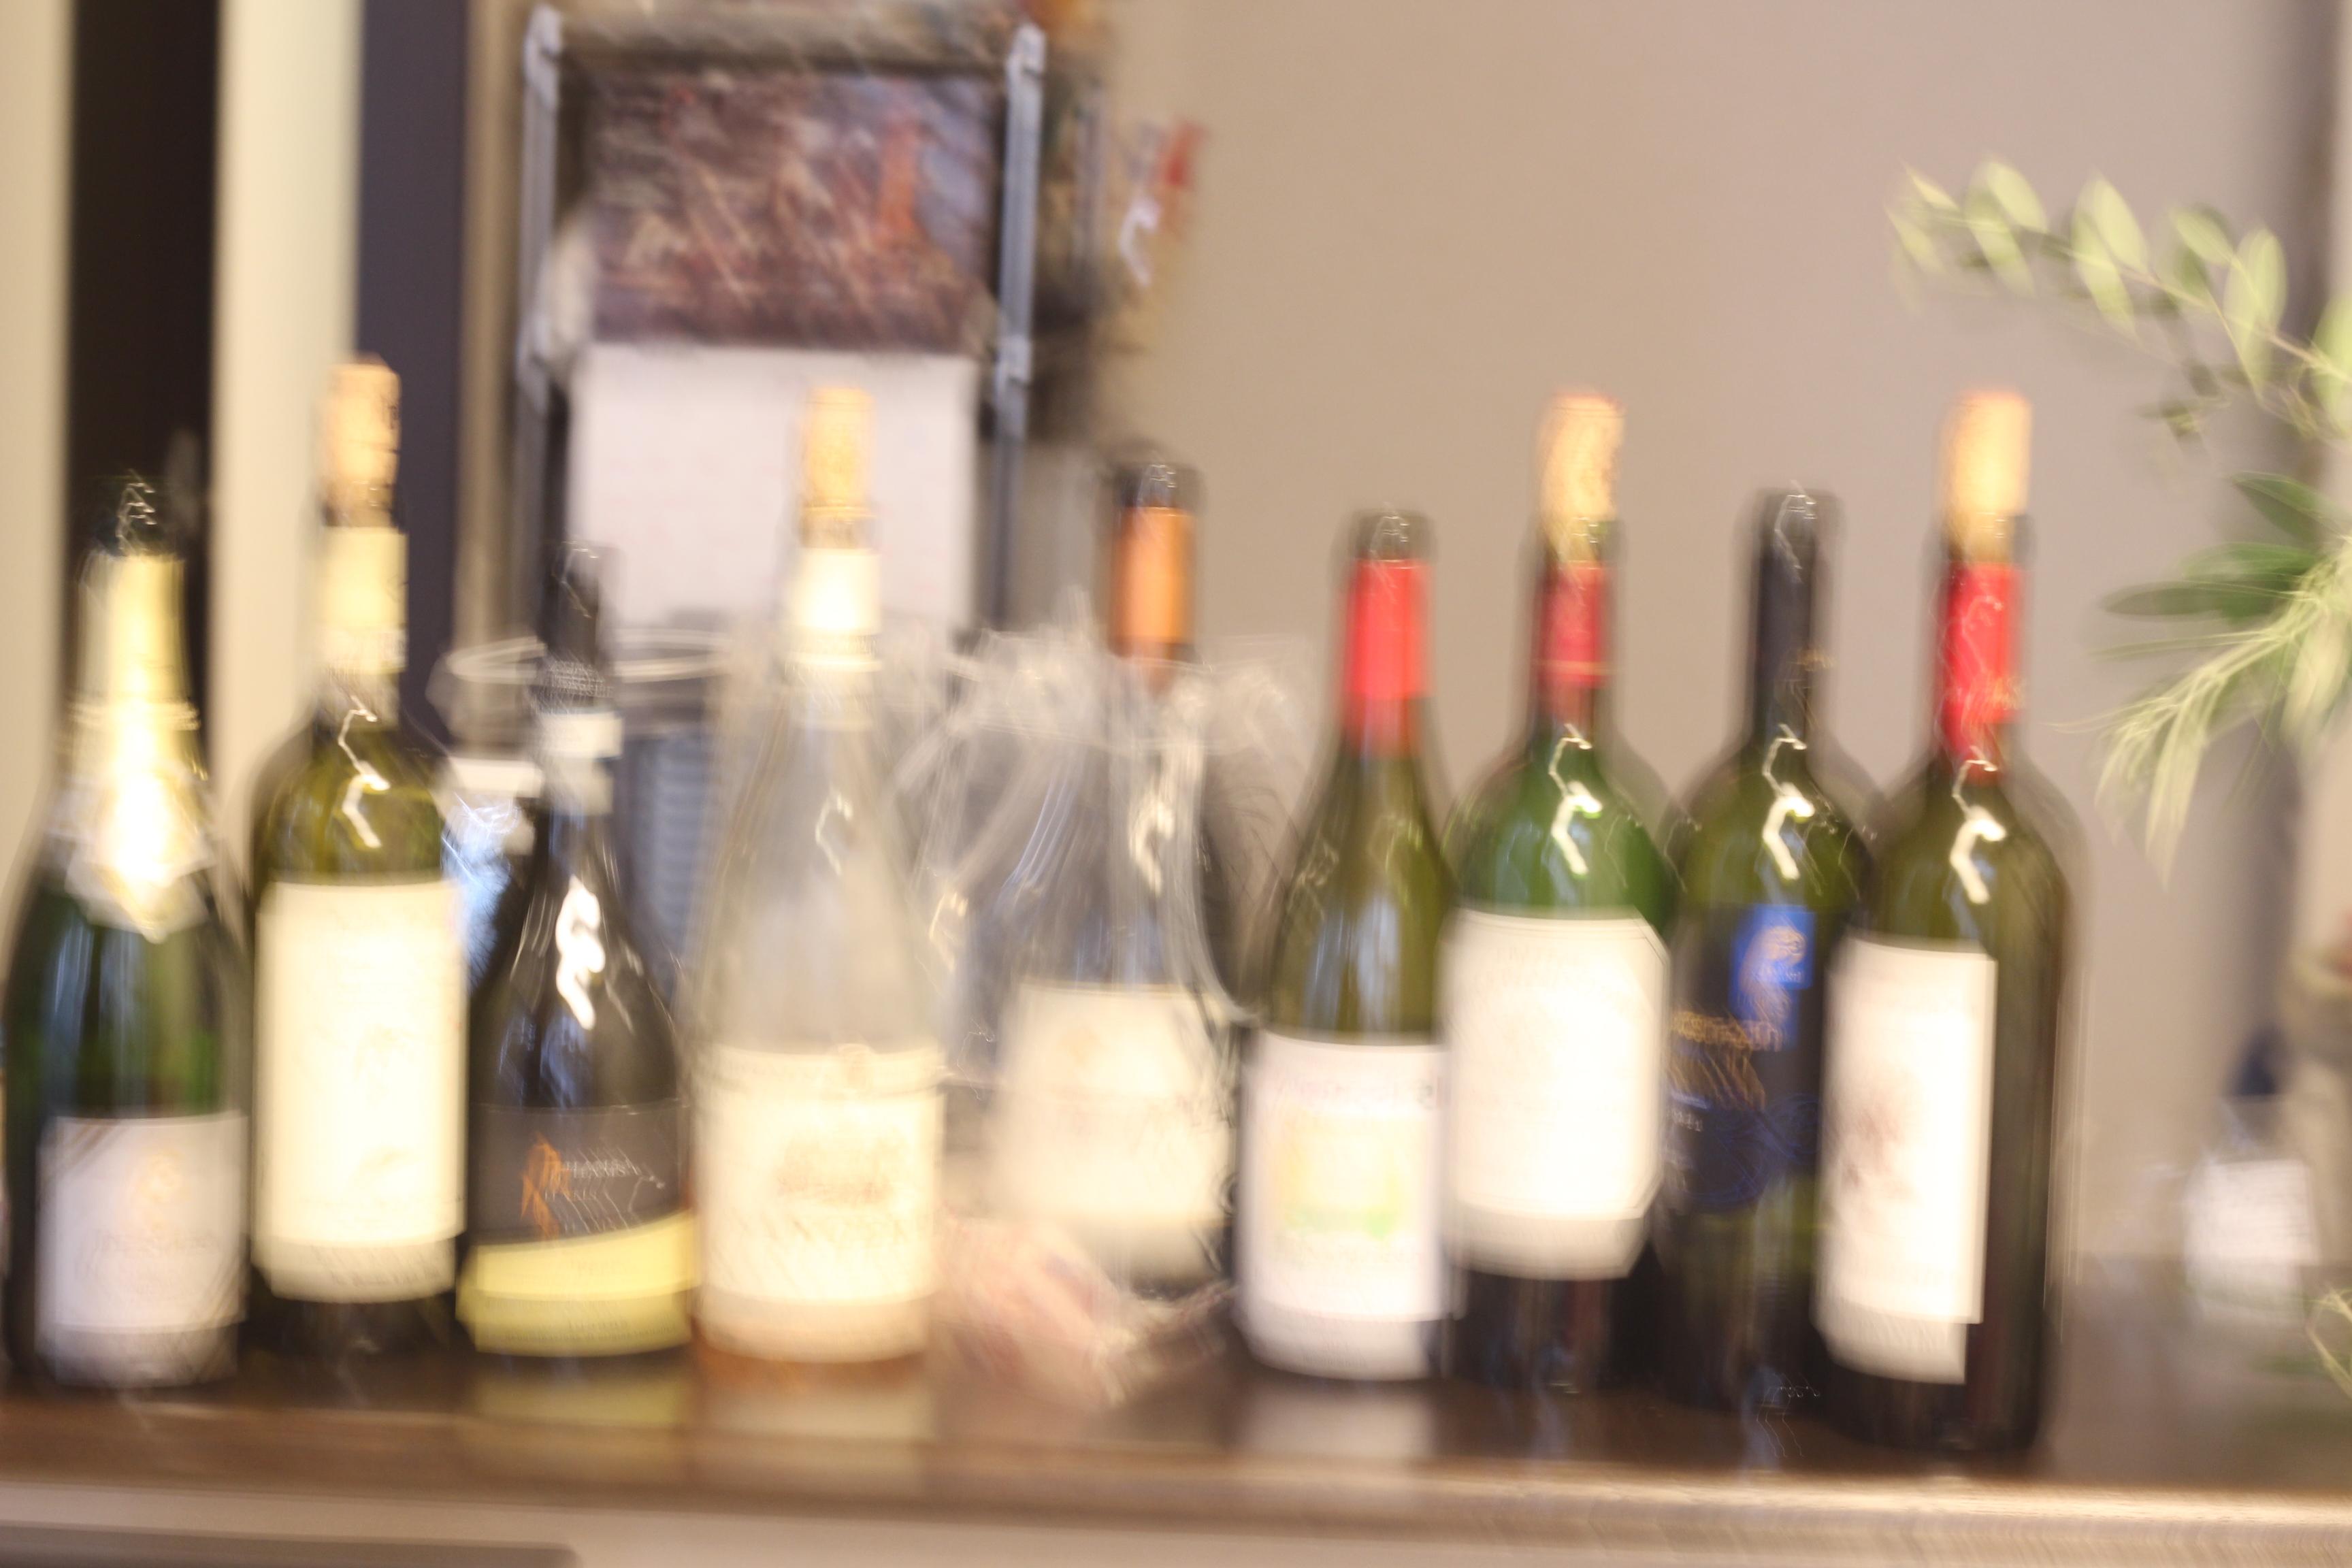 a-ta-sante糖質制限パン料理教室、阿倍野区西田辺。華麗なる女子会『ワインとお料理を楽しむ一時』